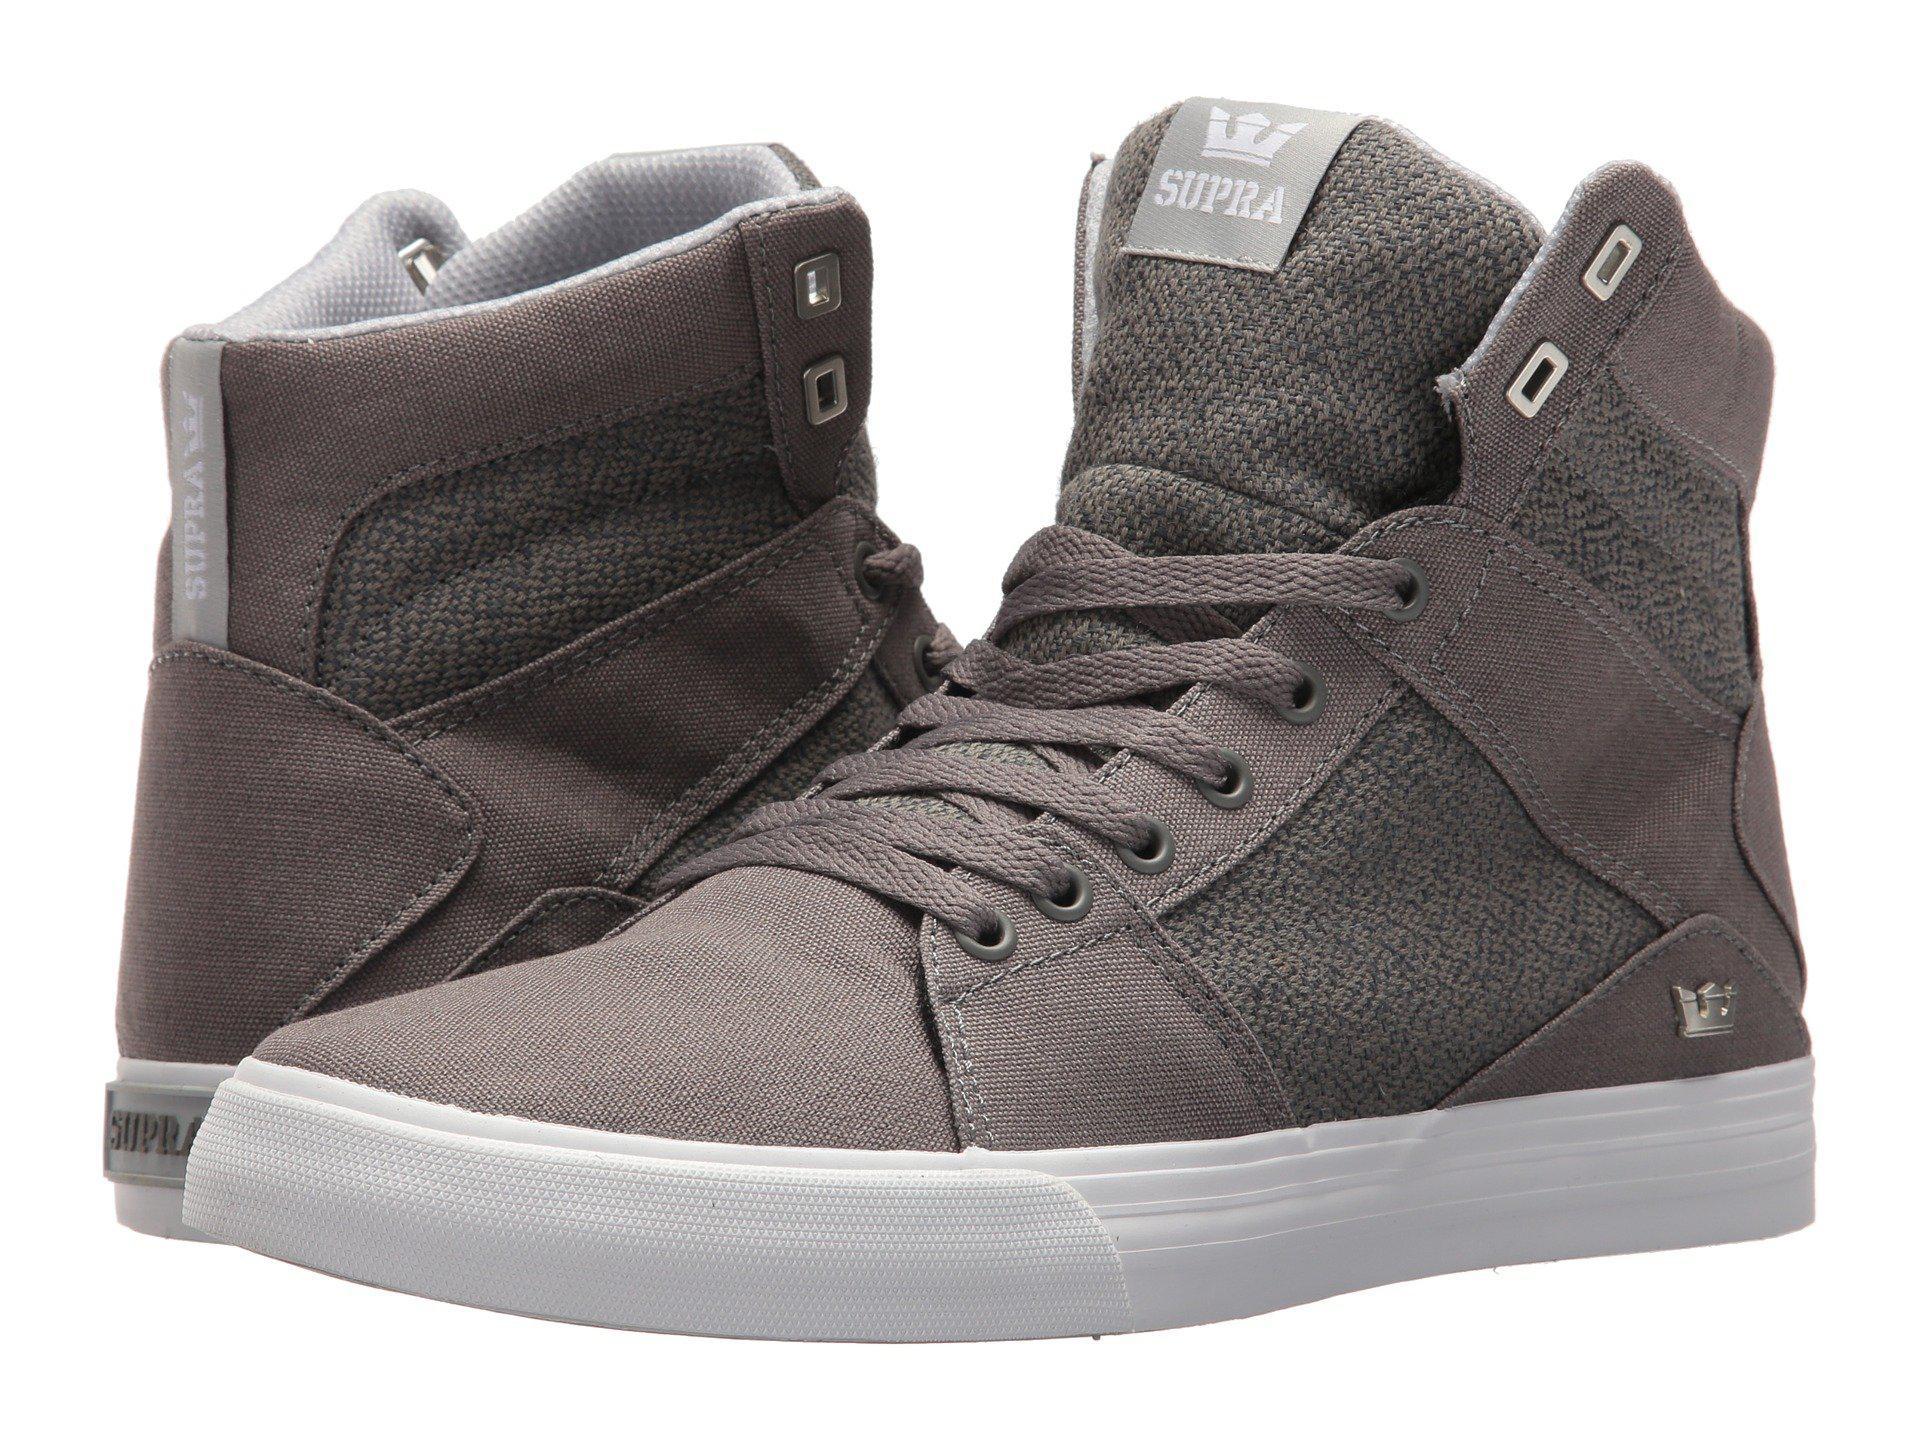 6ffa2cf709c1 Lyst - Supra Aluminum (grey light Grey white) Men s Skate Shoes in ...